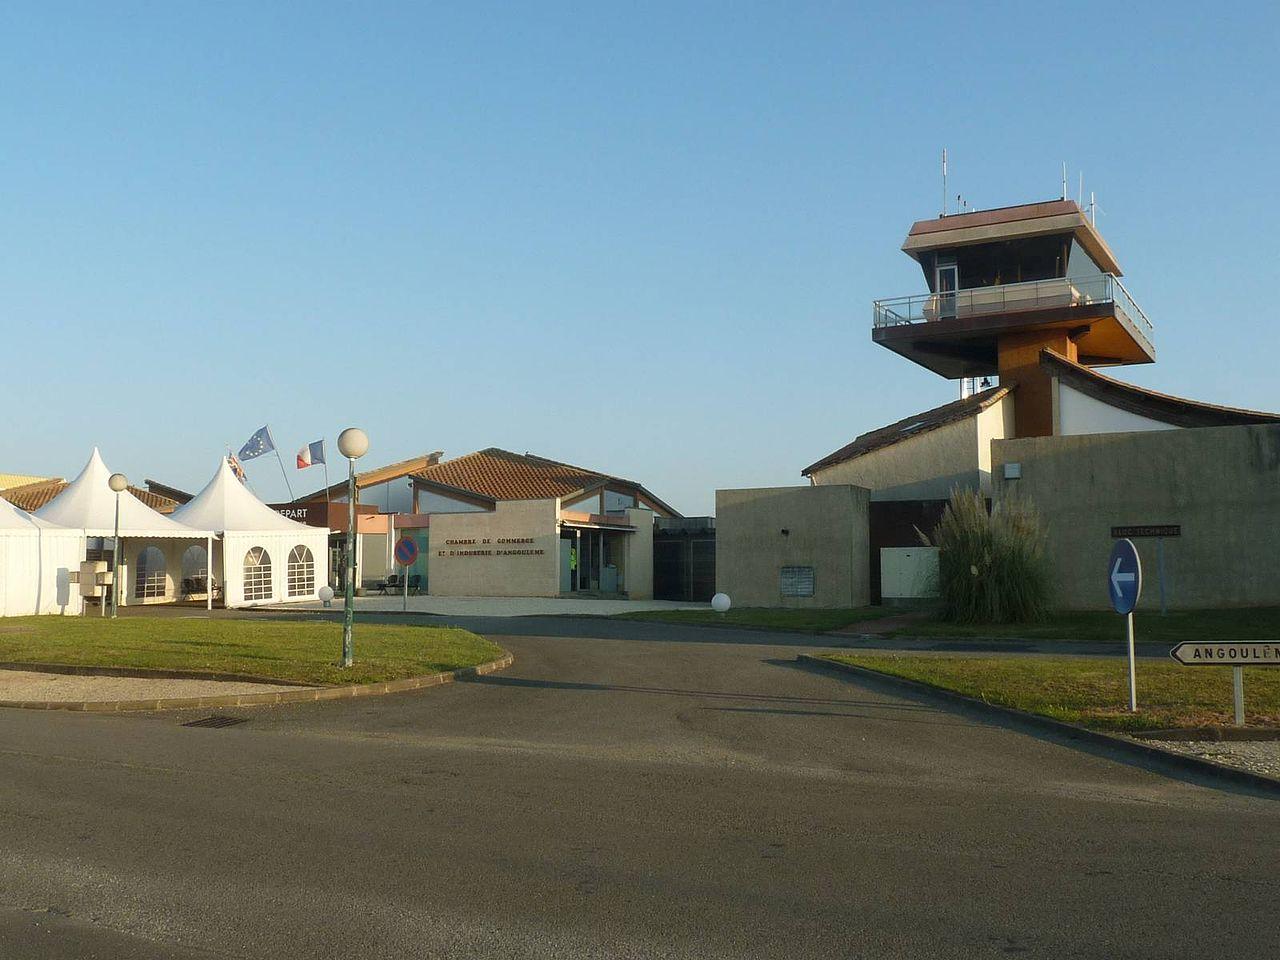 Angouleme-Cognac-Airport